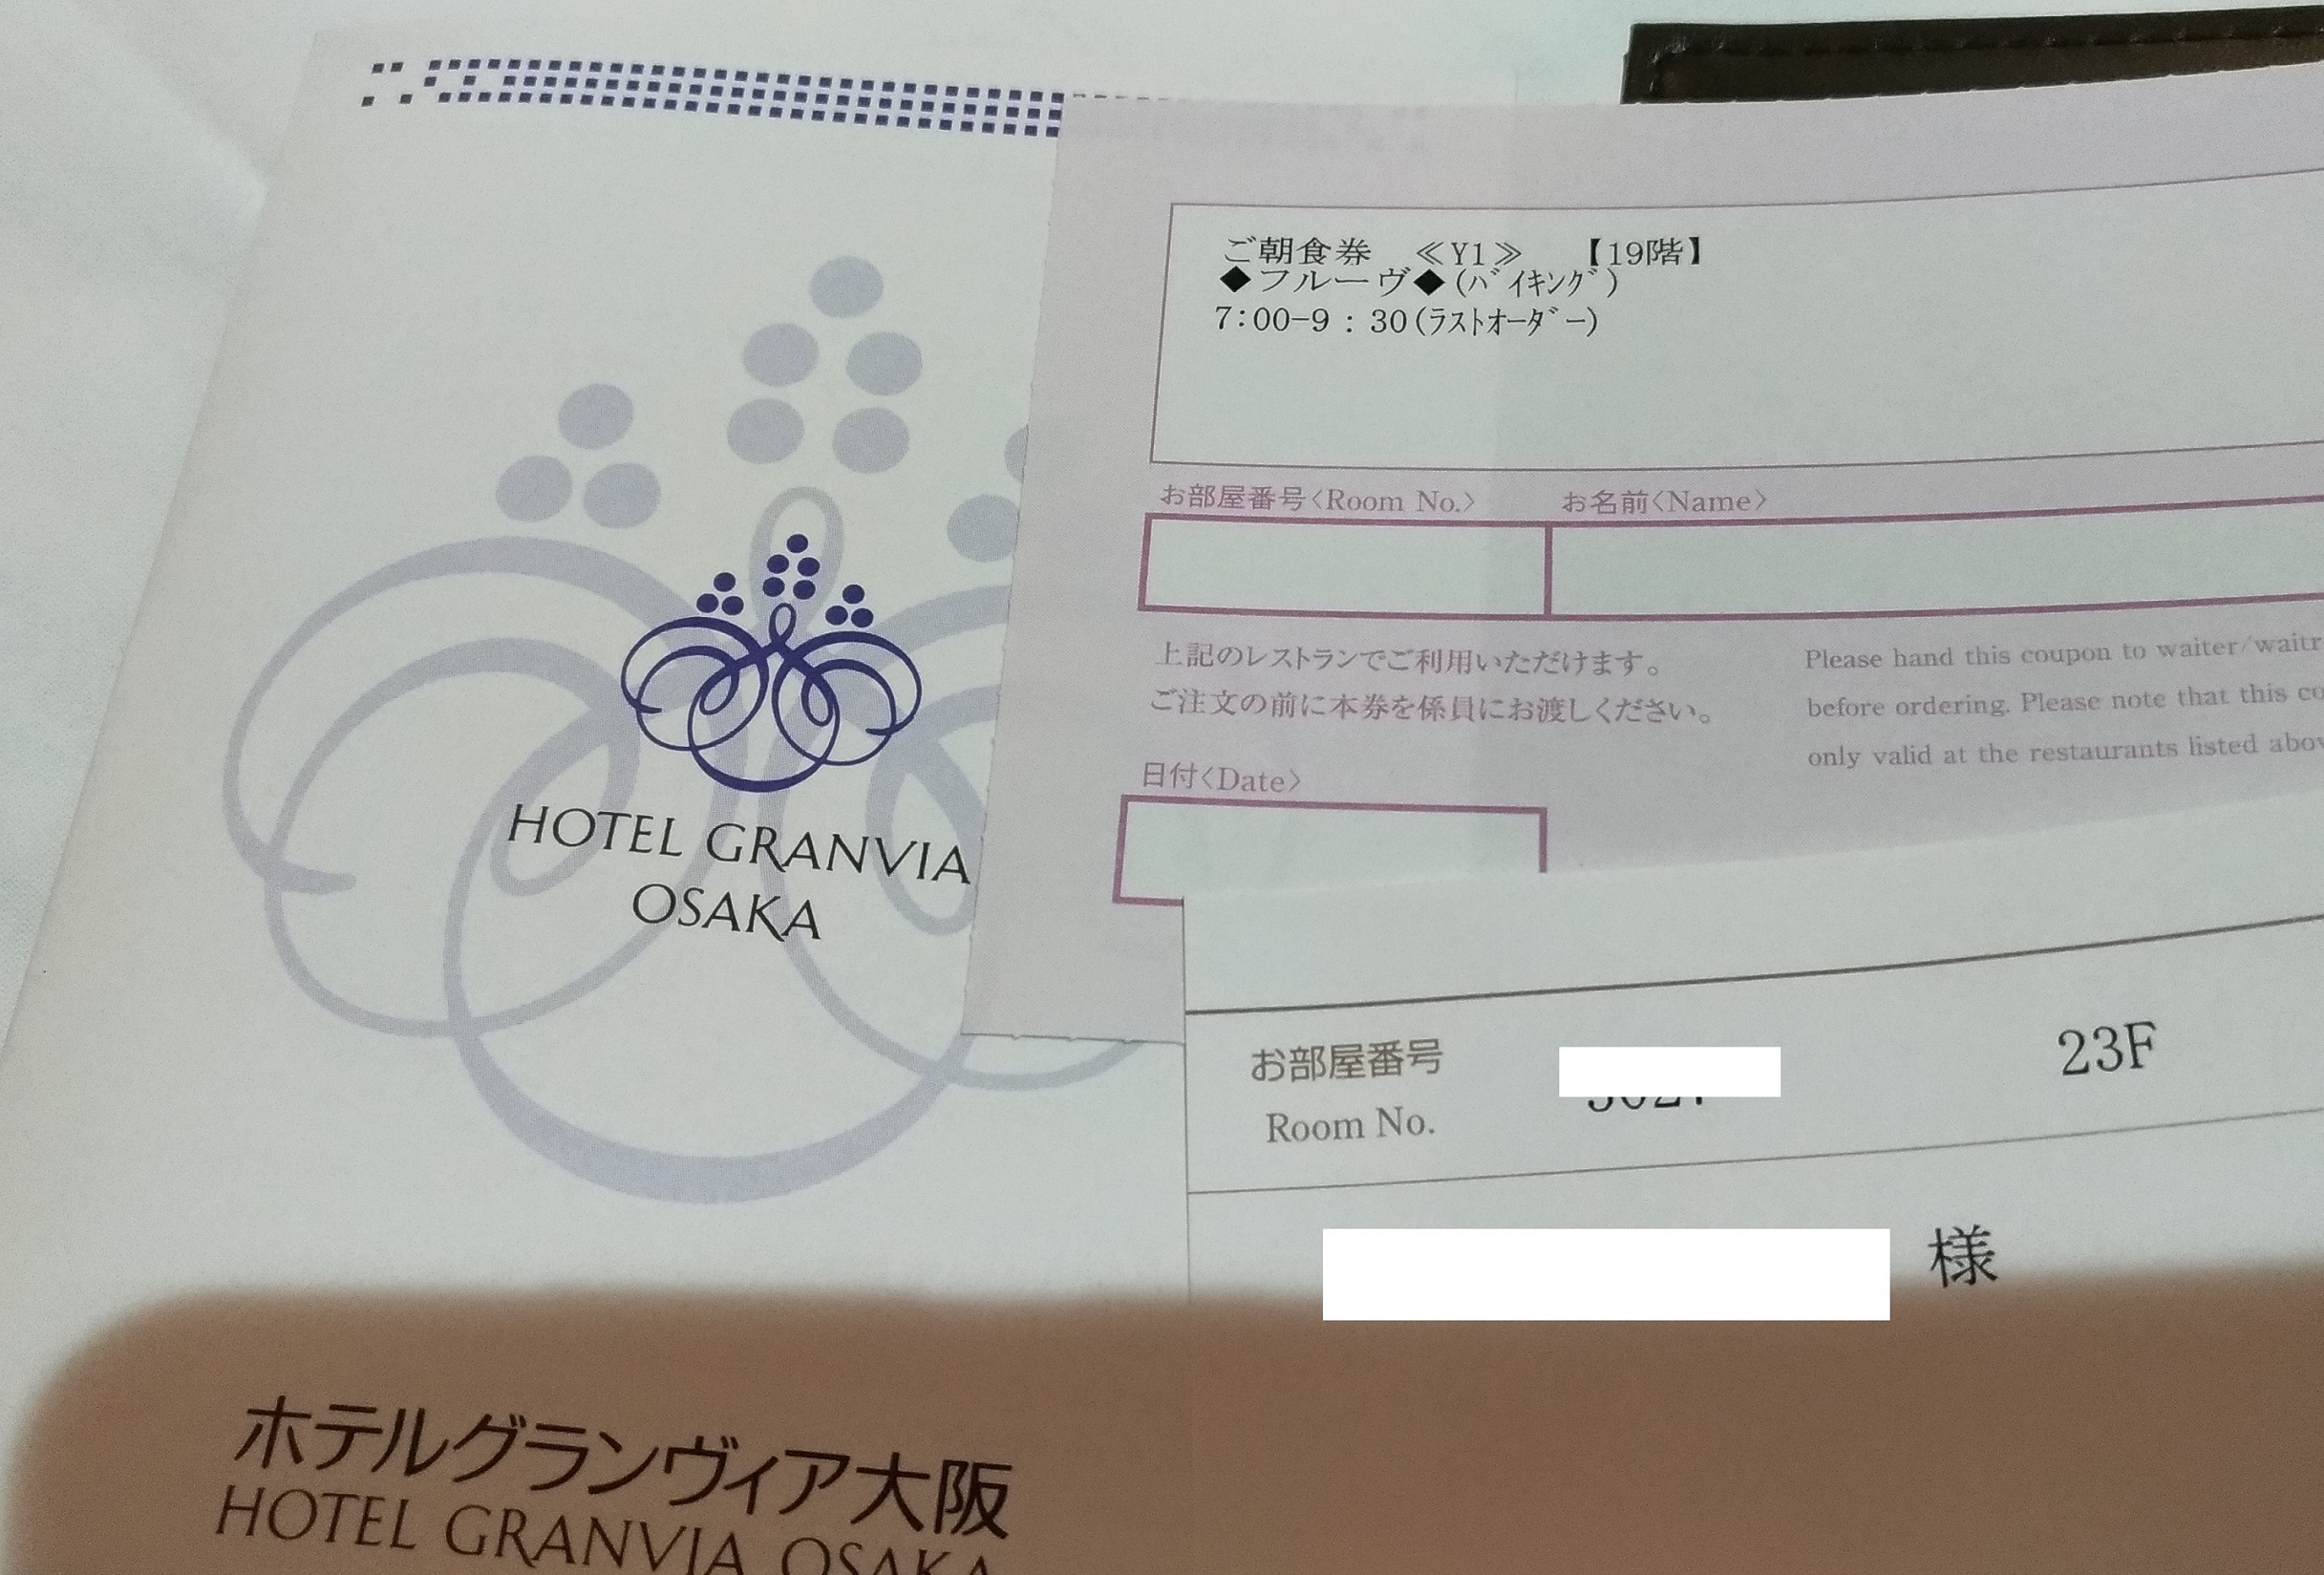 osaka_hotel_umeda_branvia.jpg